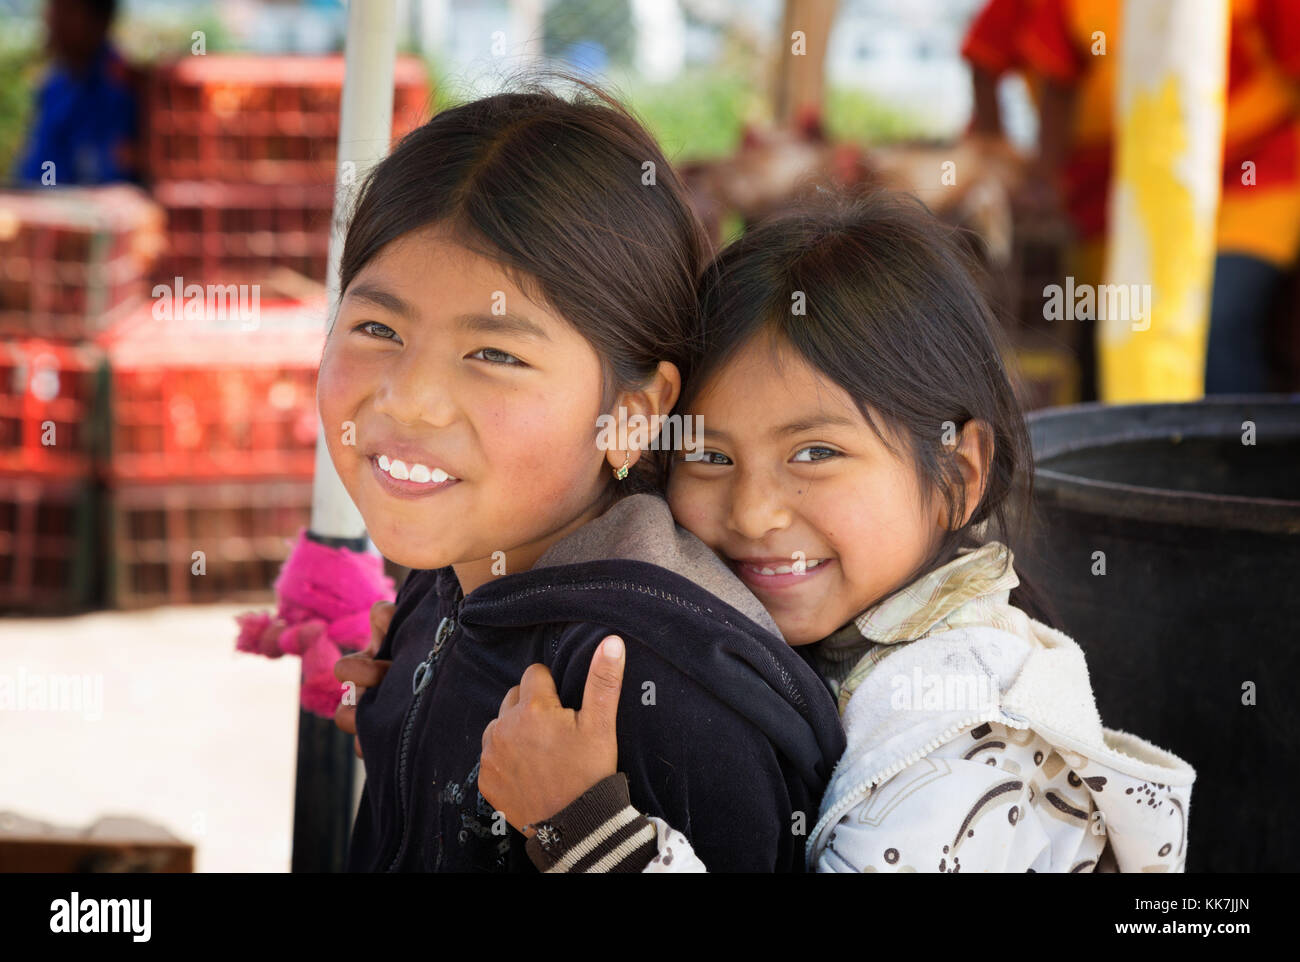 Agree with ecuador young girls congratulate, seems